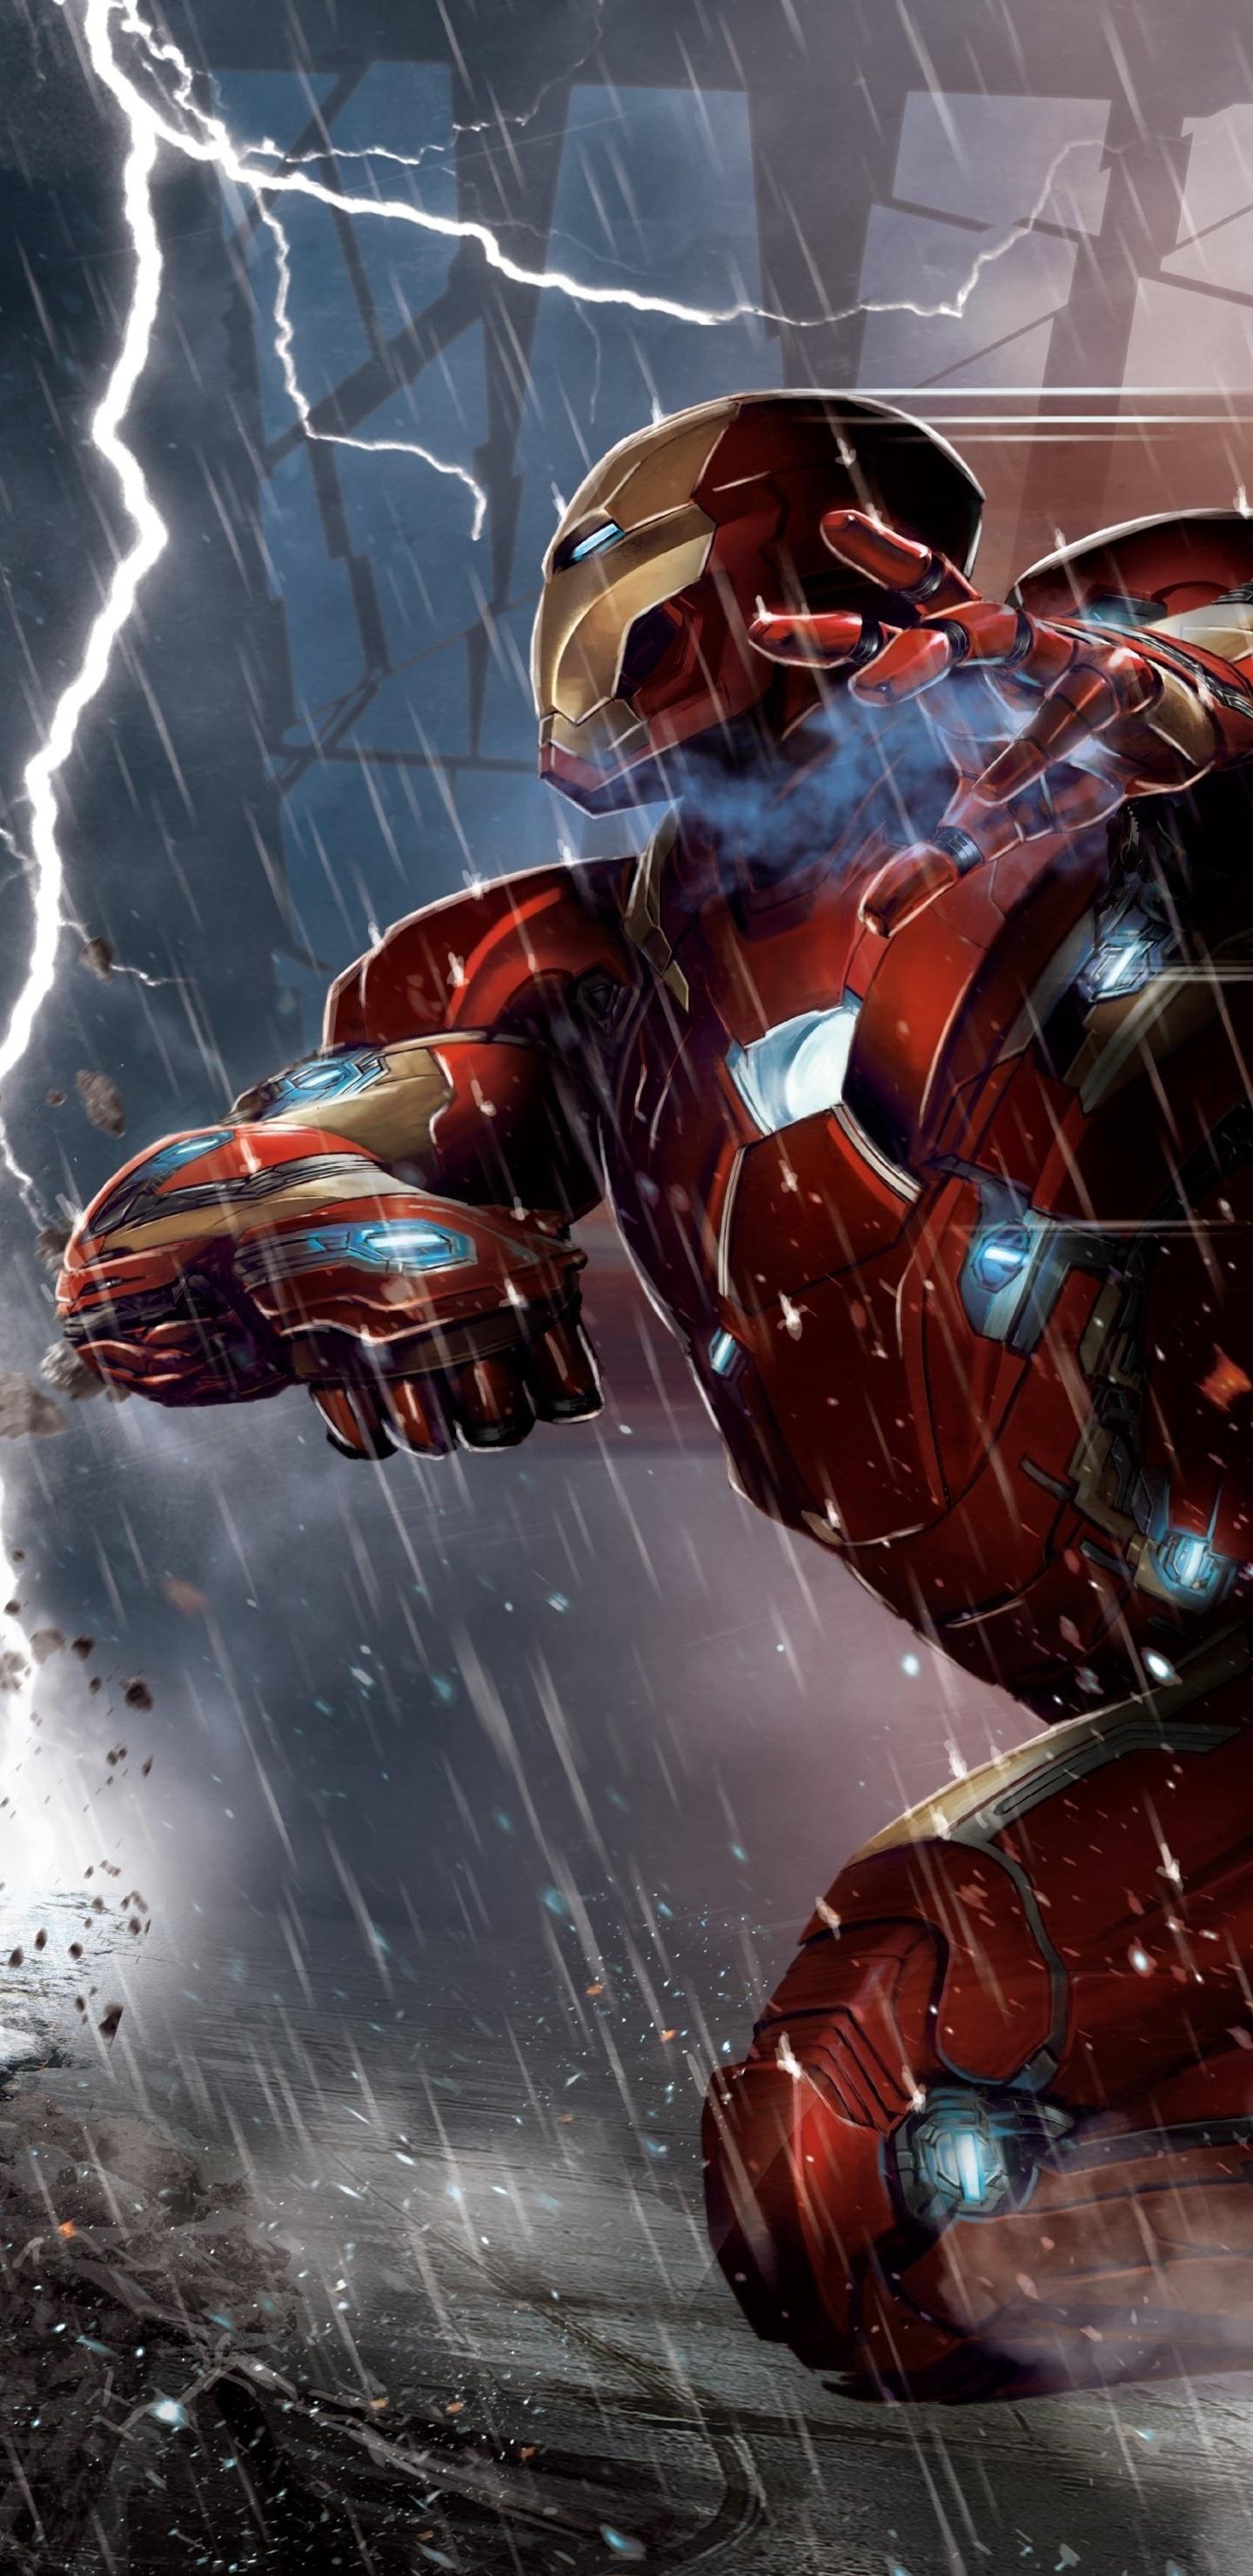 1440x2960 Captain America Vs Iron Man Comic 5k Samsung Galaxy Note 9